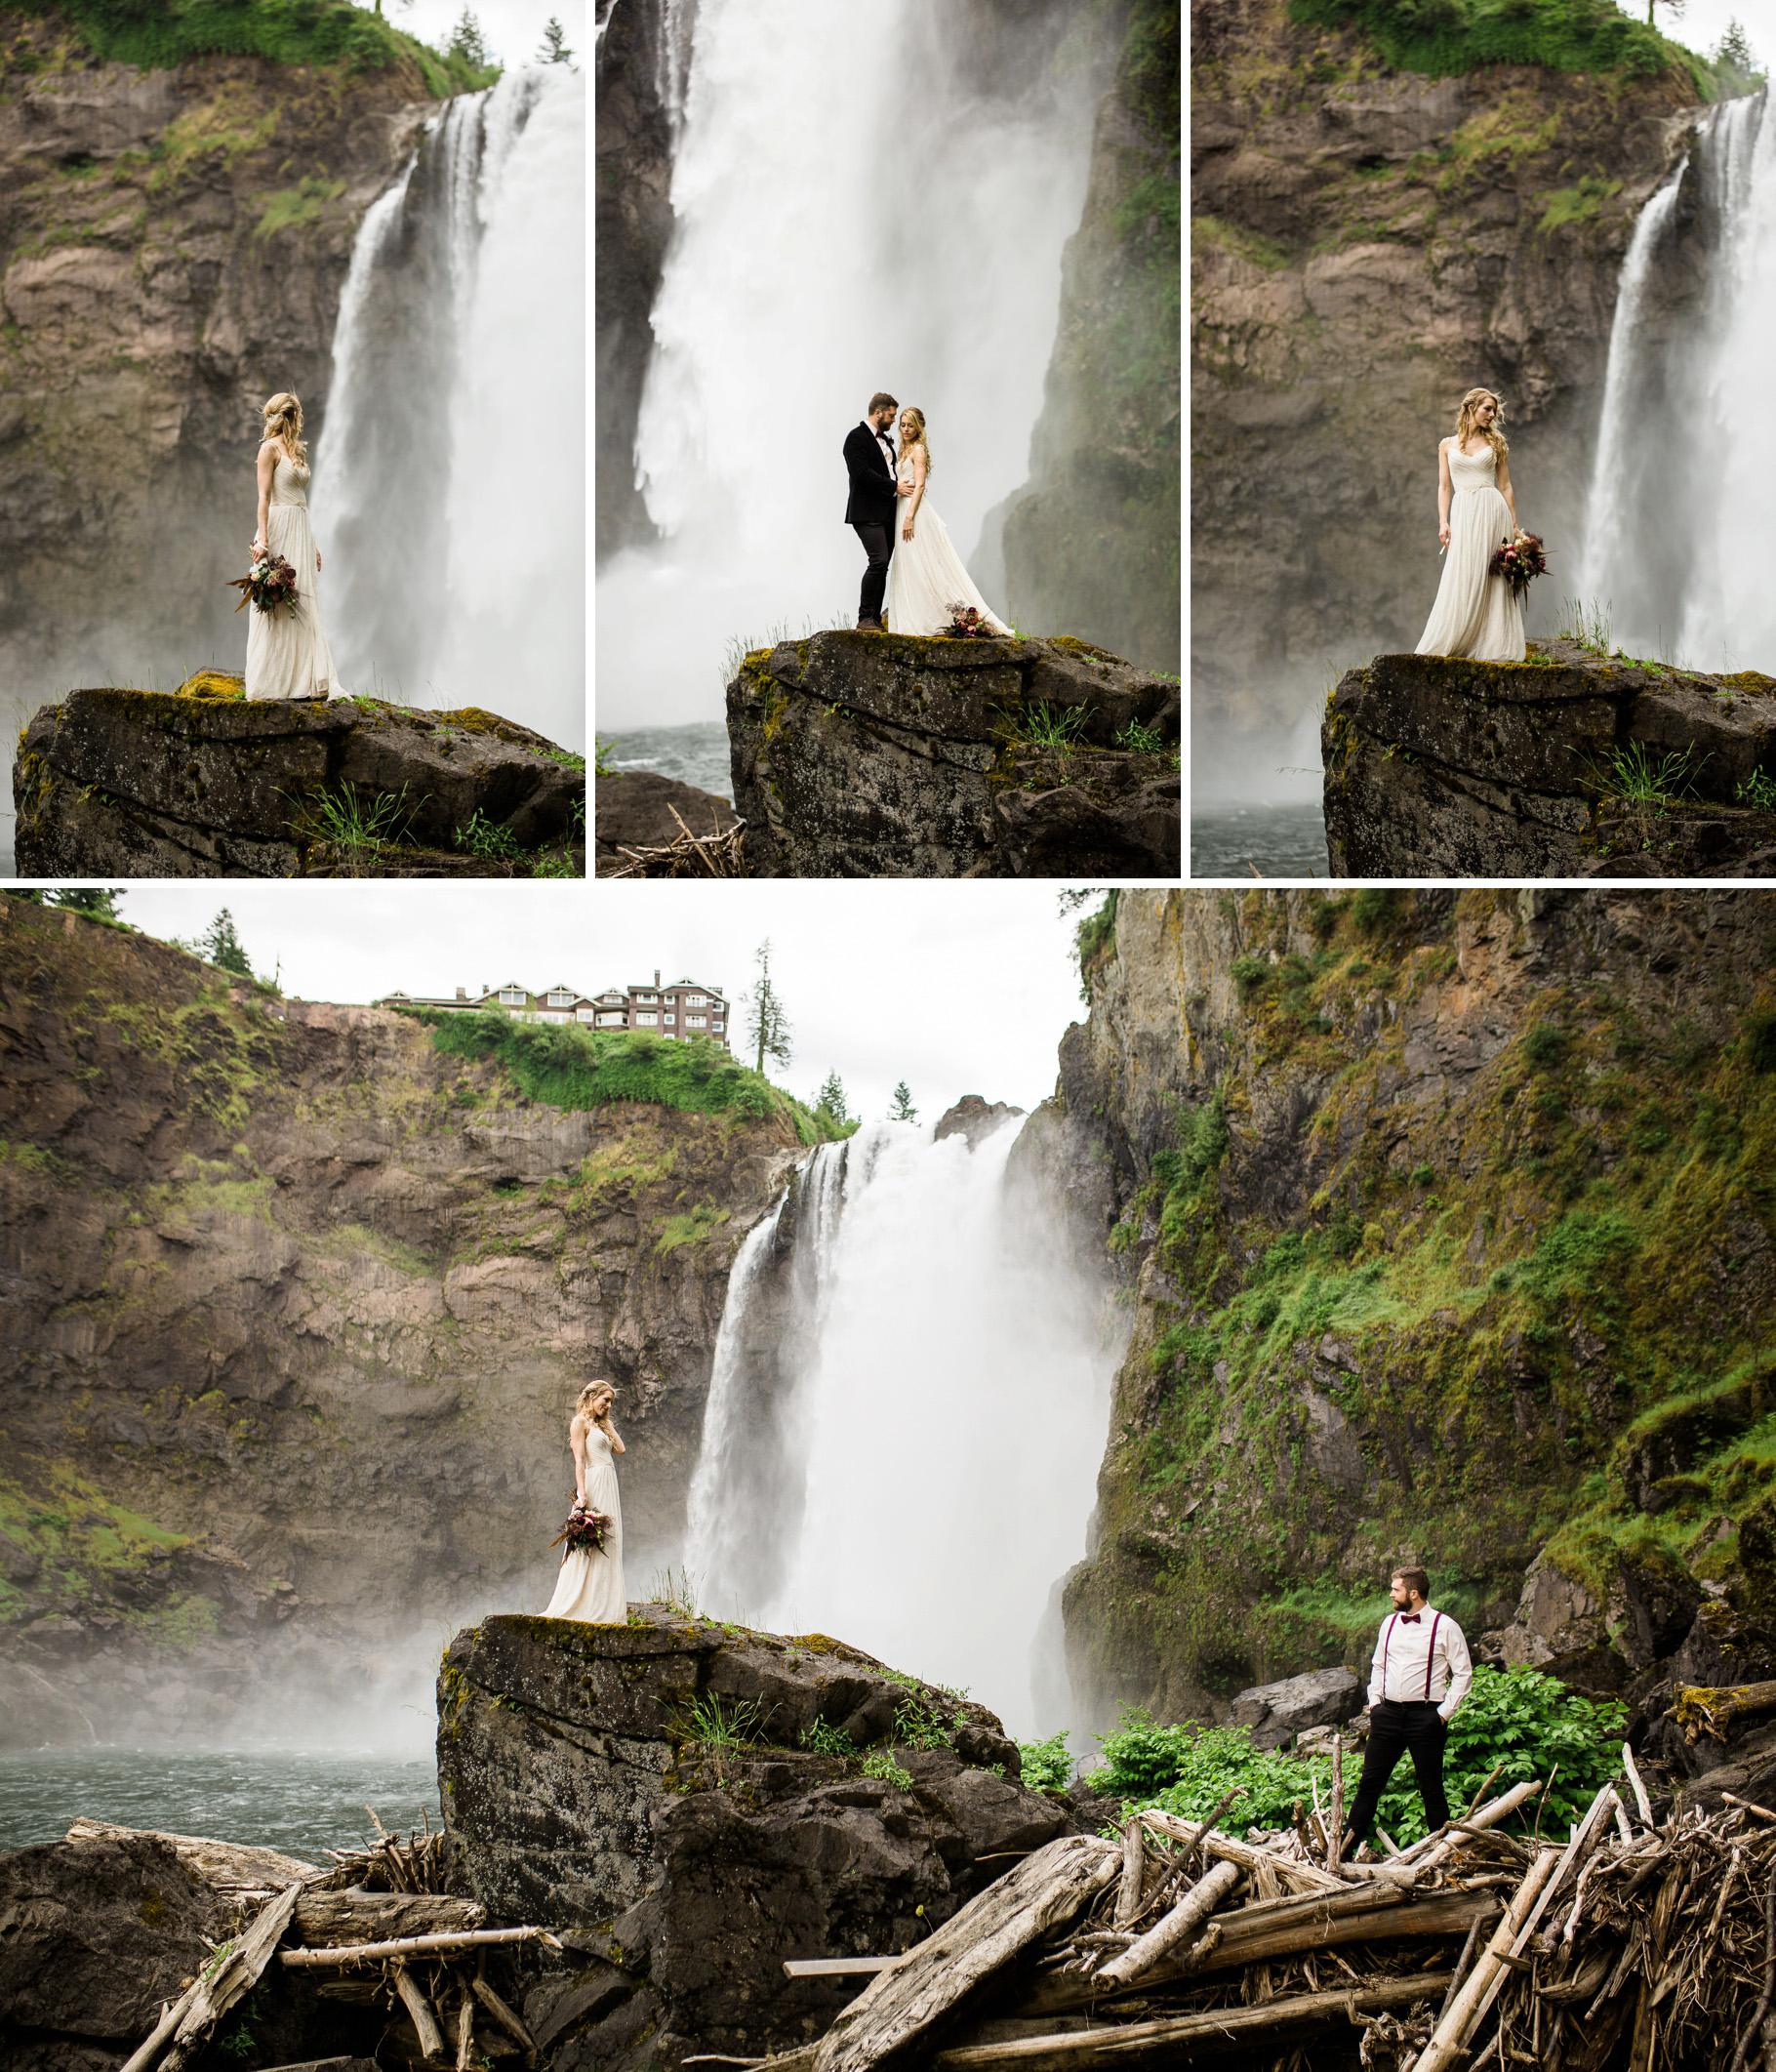 25-Adventure-Elopement-Waterfall-Seattle-Wedding-Photographer-Snoqualmie-Falls-Hike